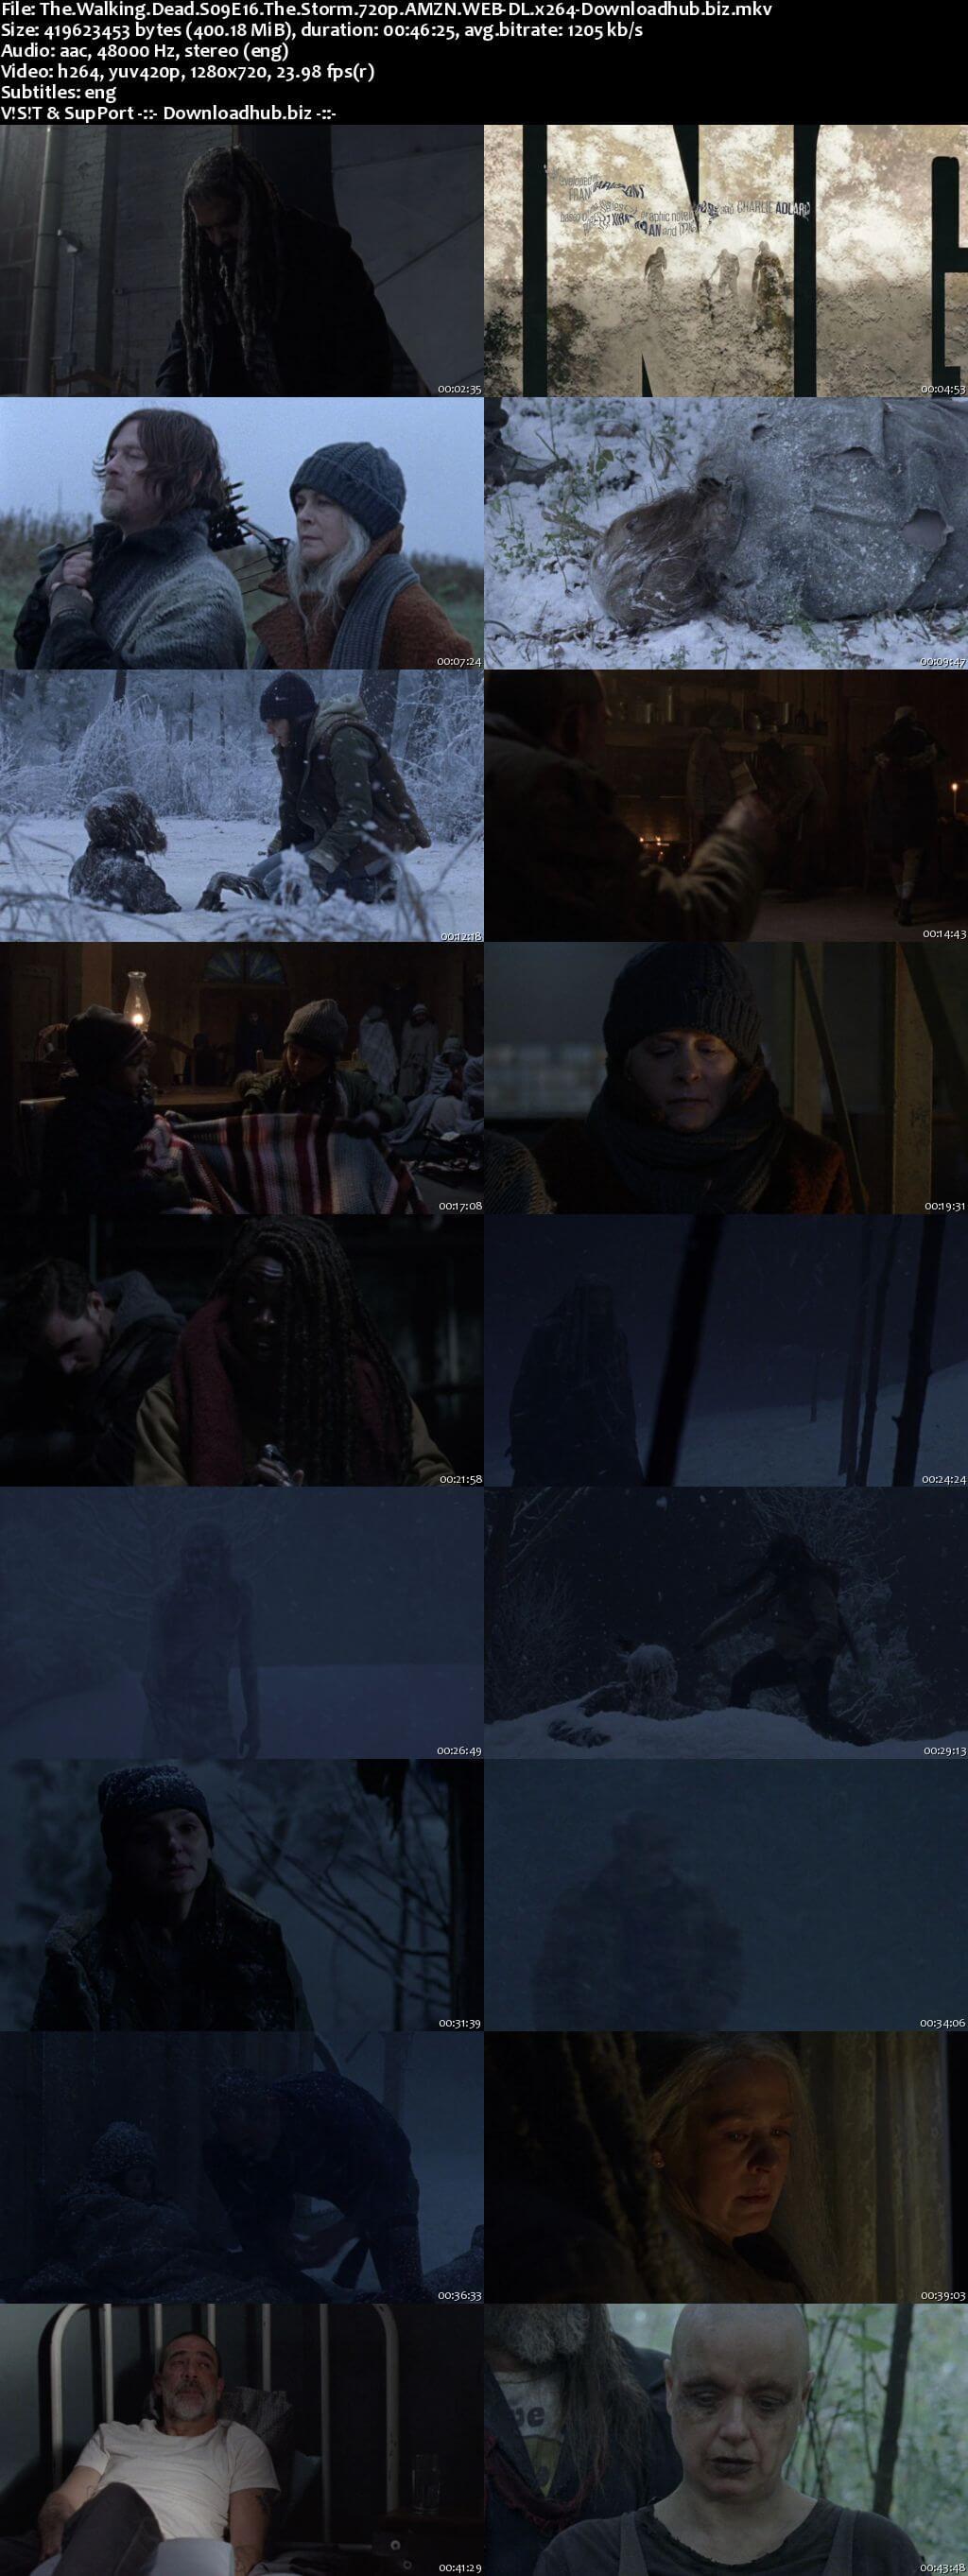 The Walking Dead S09E16 400MB AMZN WEB-DL 720p ESubs